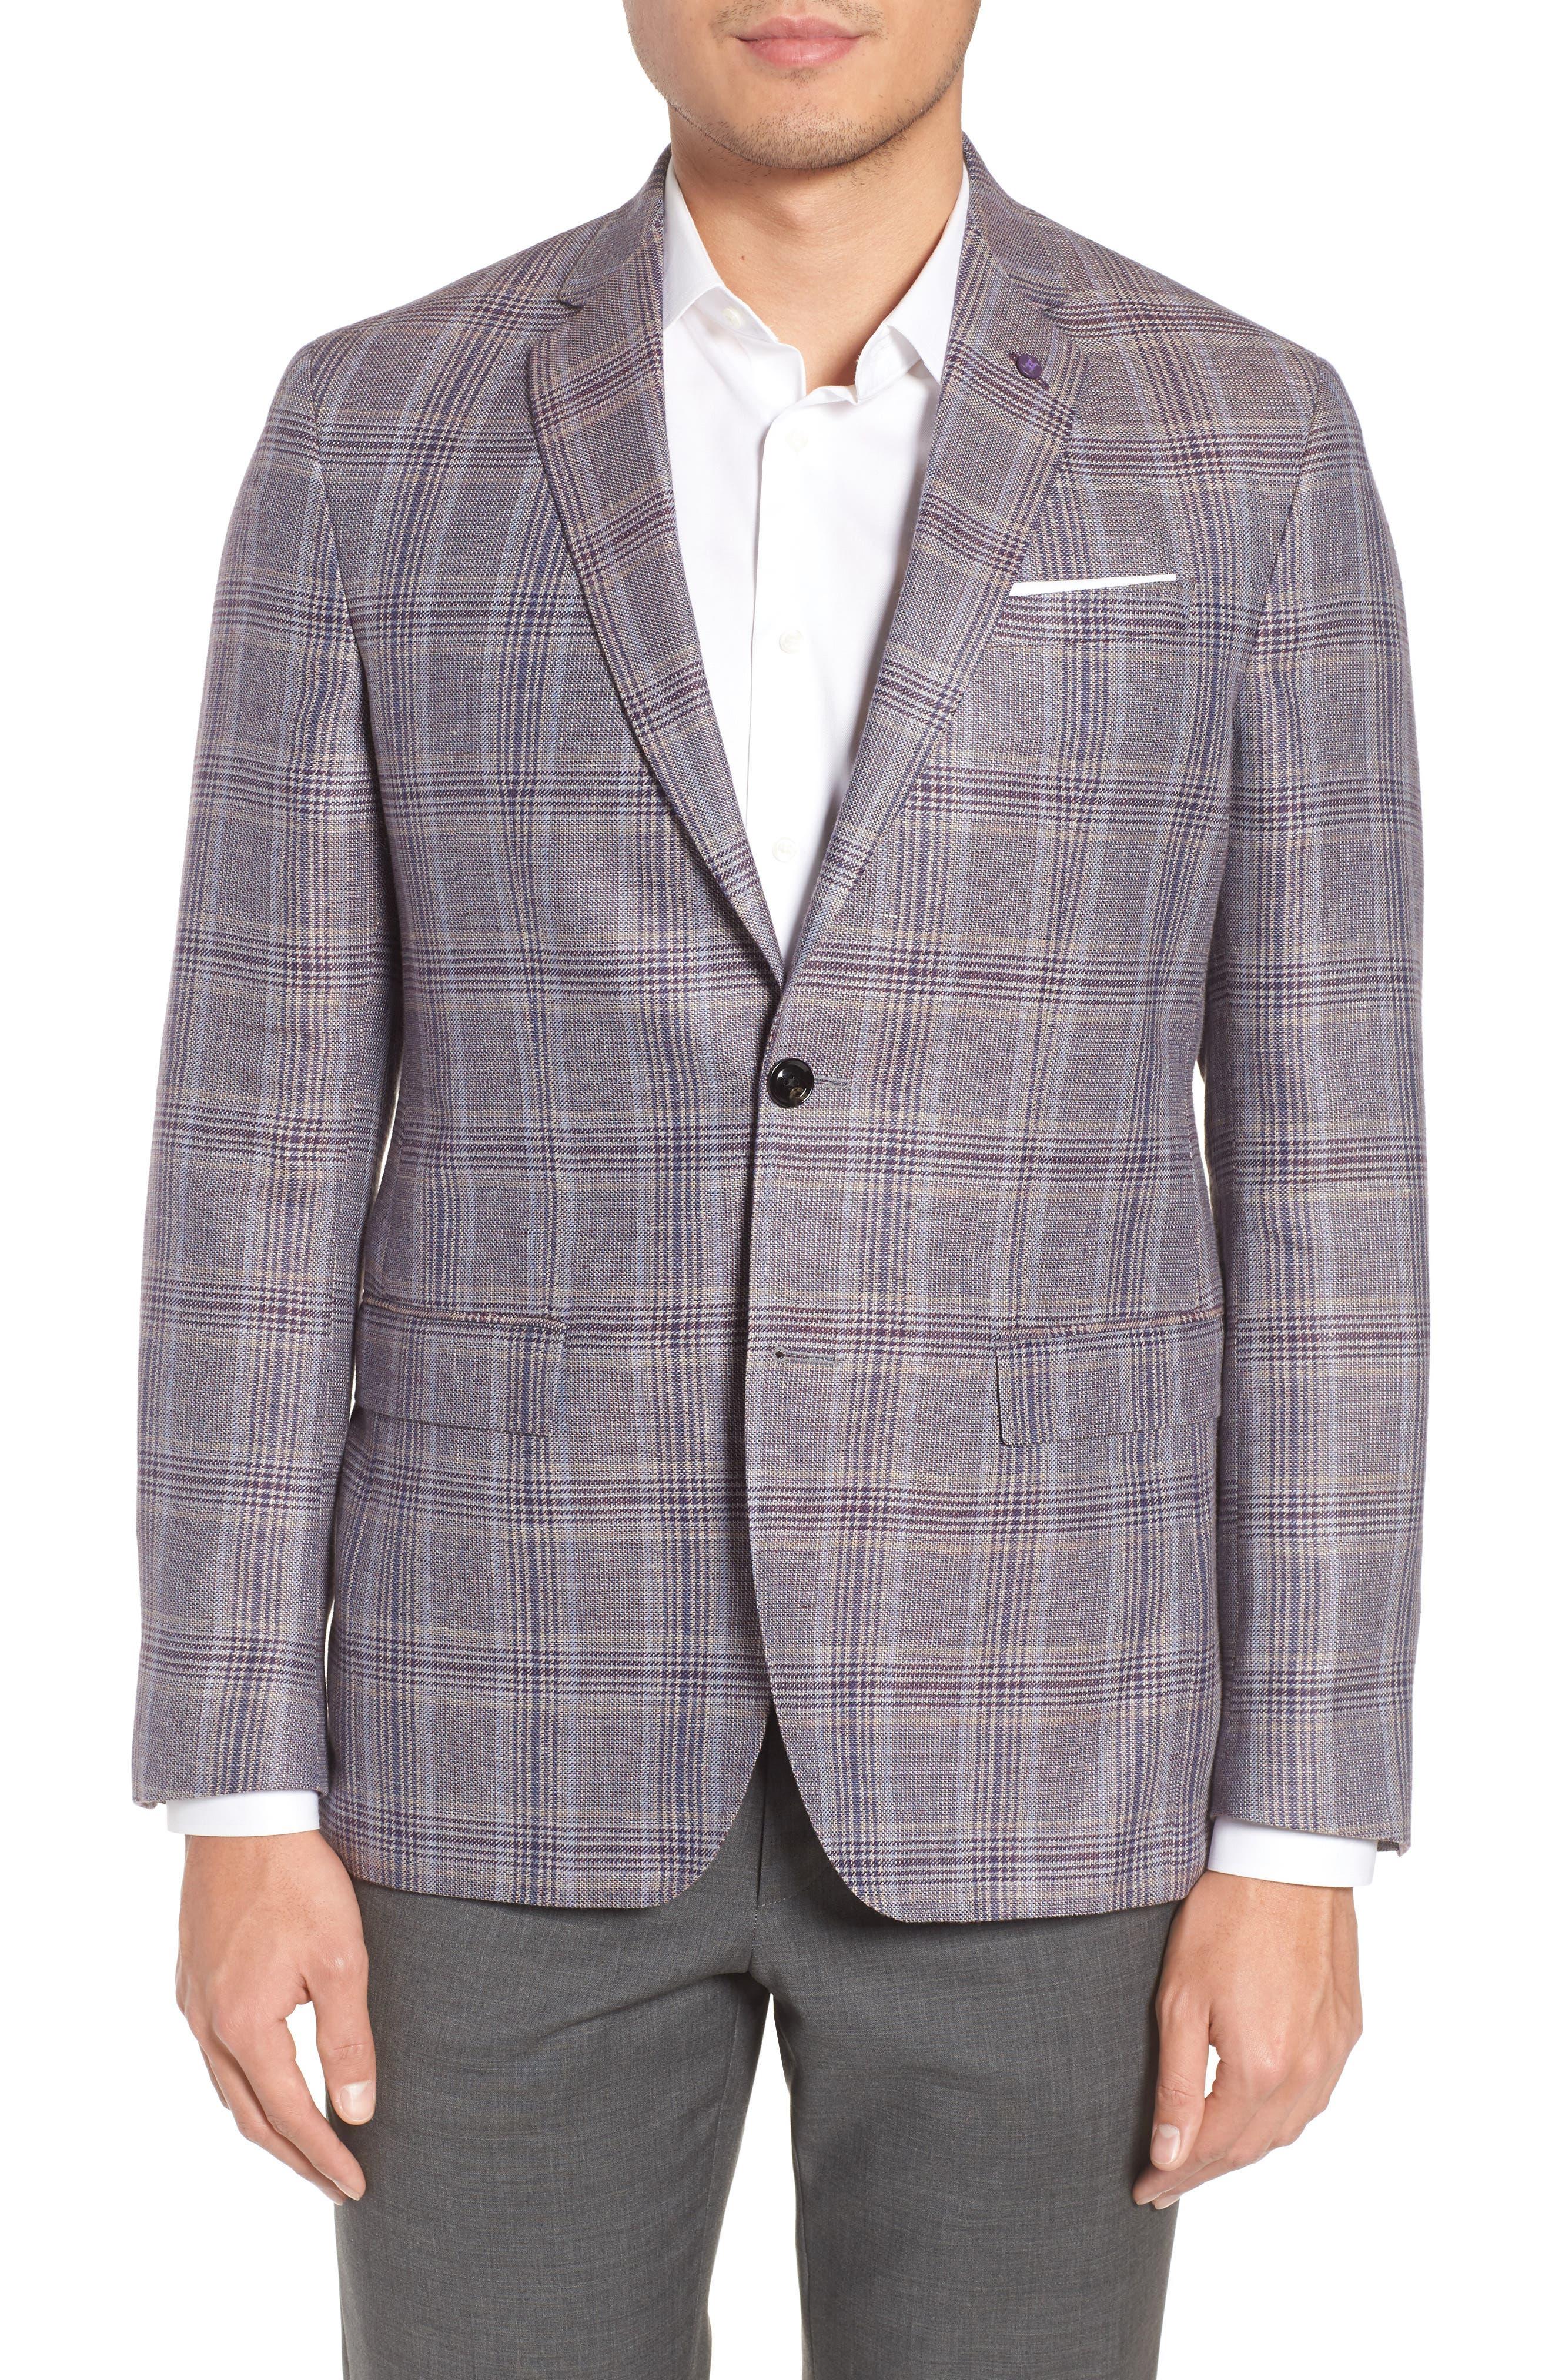 Konan Trim Fit Plaid Linen & Wool Sport Coat,                             Main thumbnail 1, color,                             270